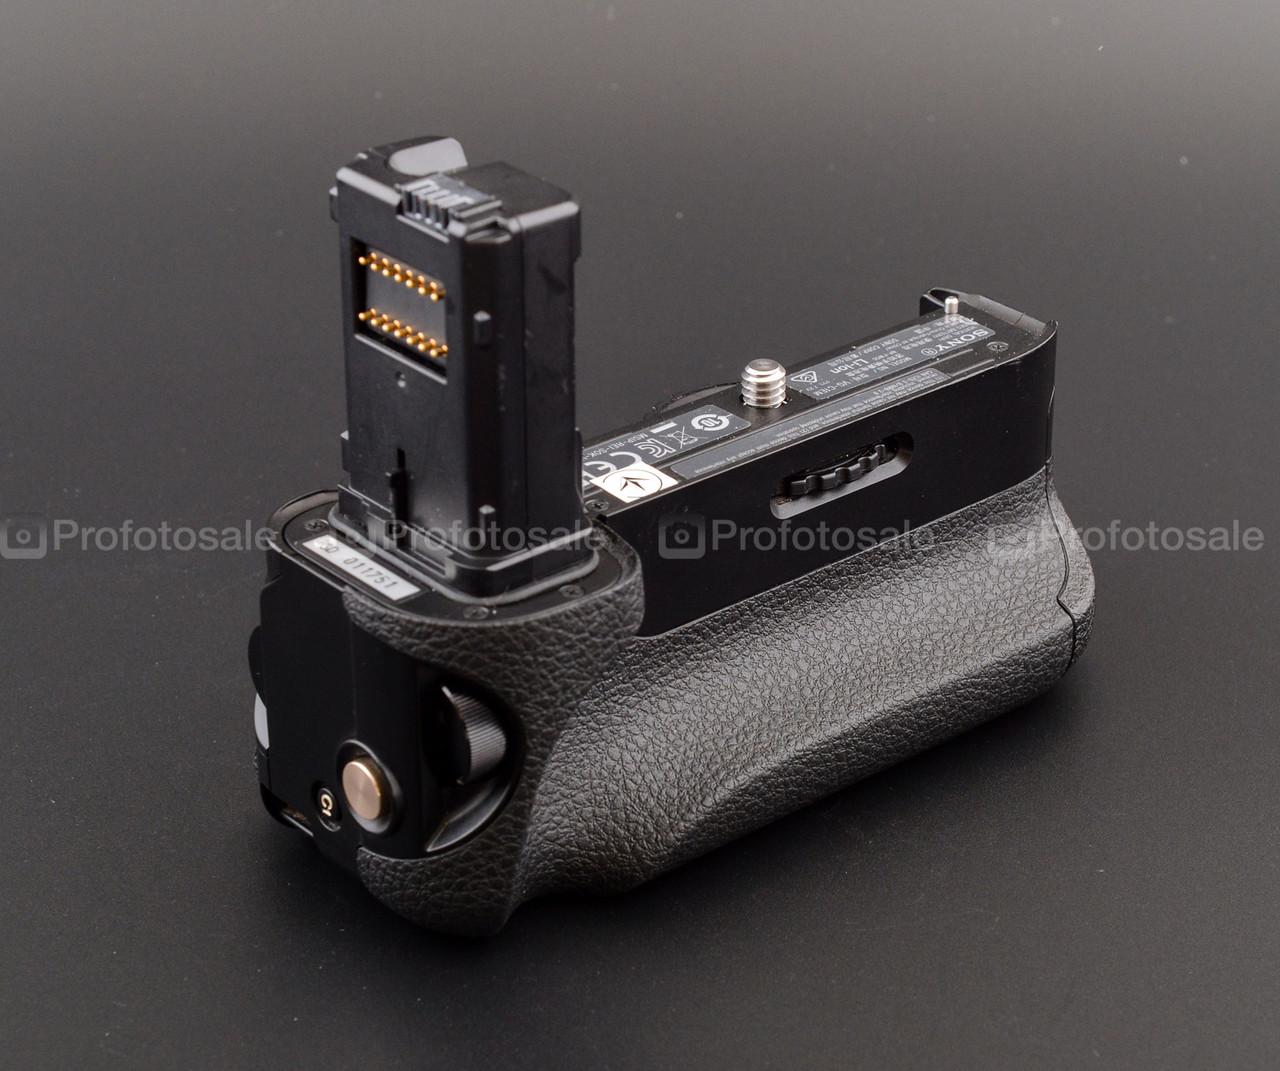 Sony VG-C1EM (батарейный блок для A7, A7R, A7S)